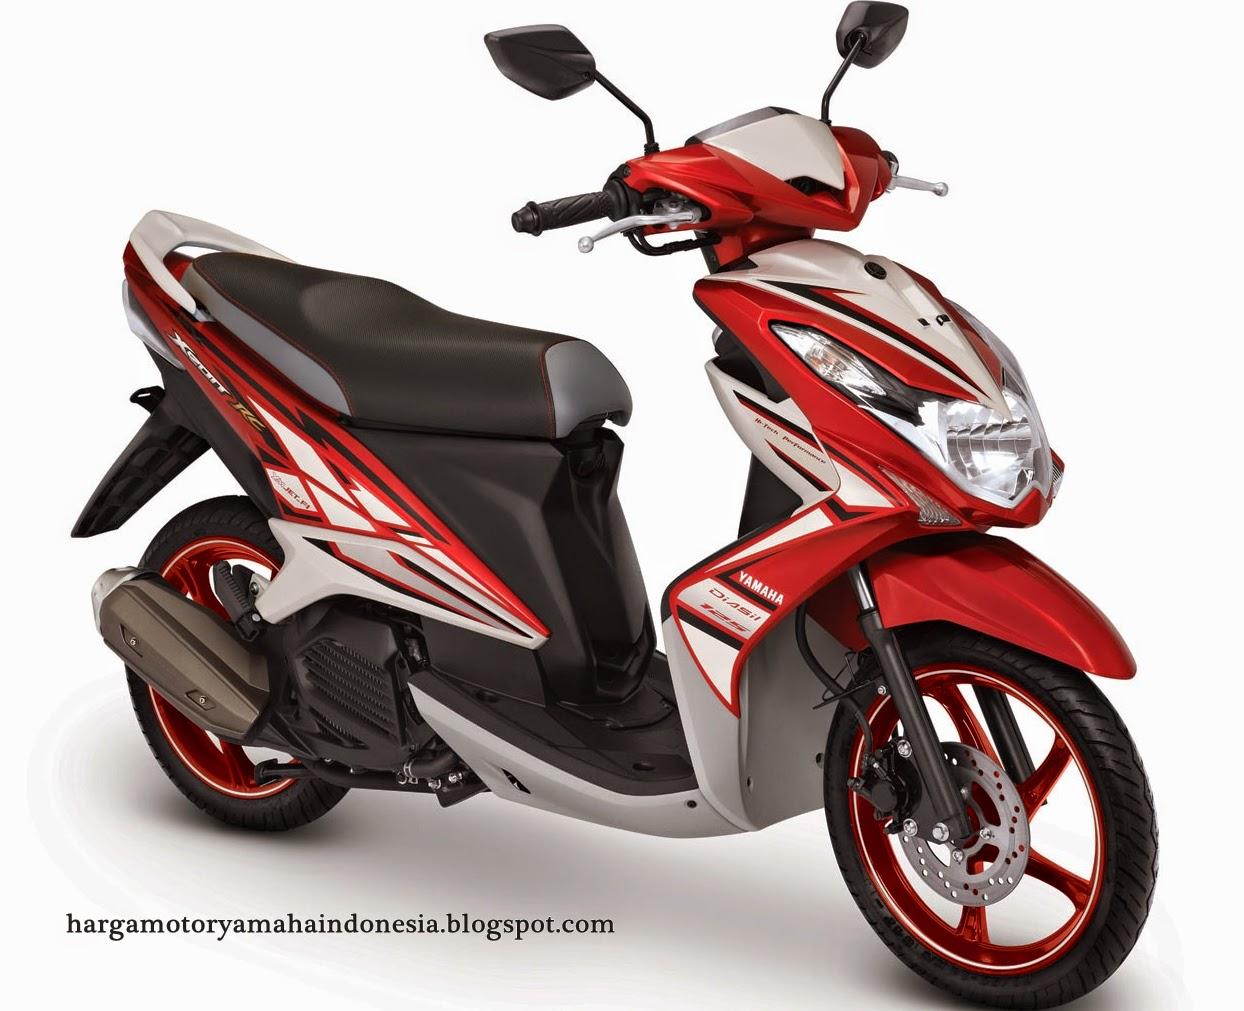 Harga Yamaha Xeon RC 125cc Terbaru 2015 - Review Spesifikasi